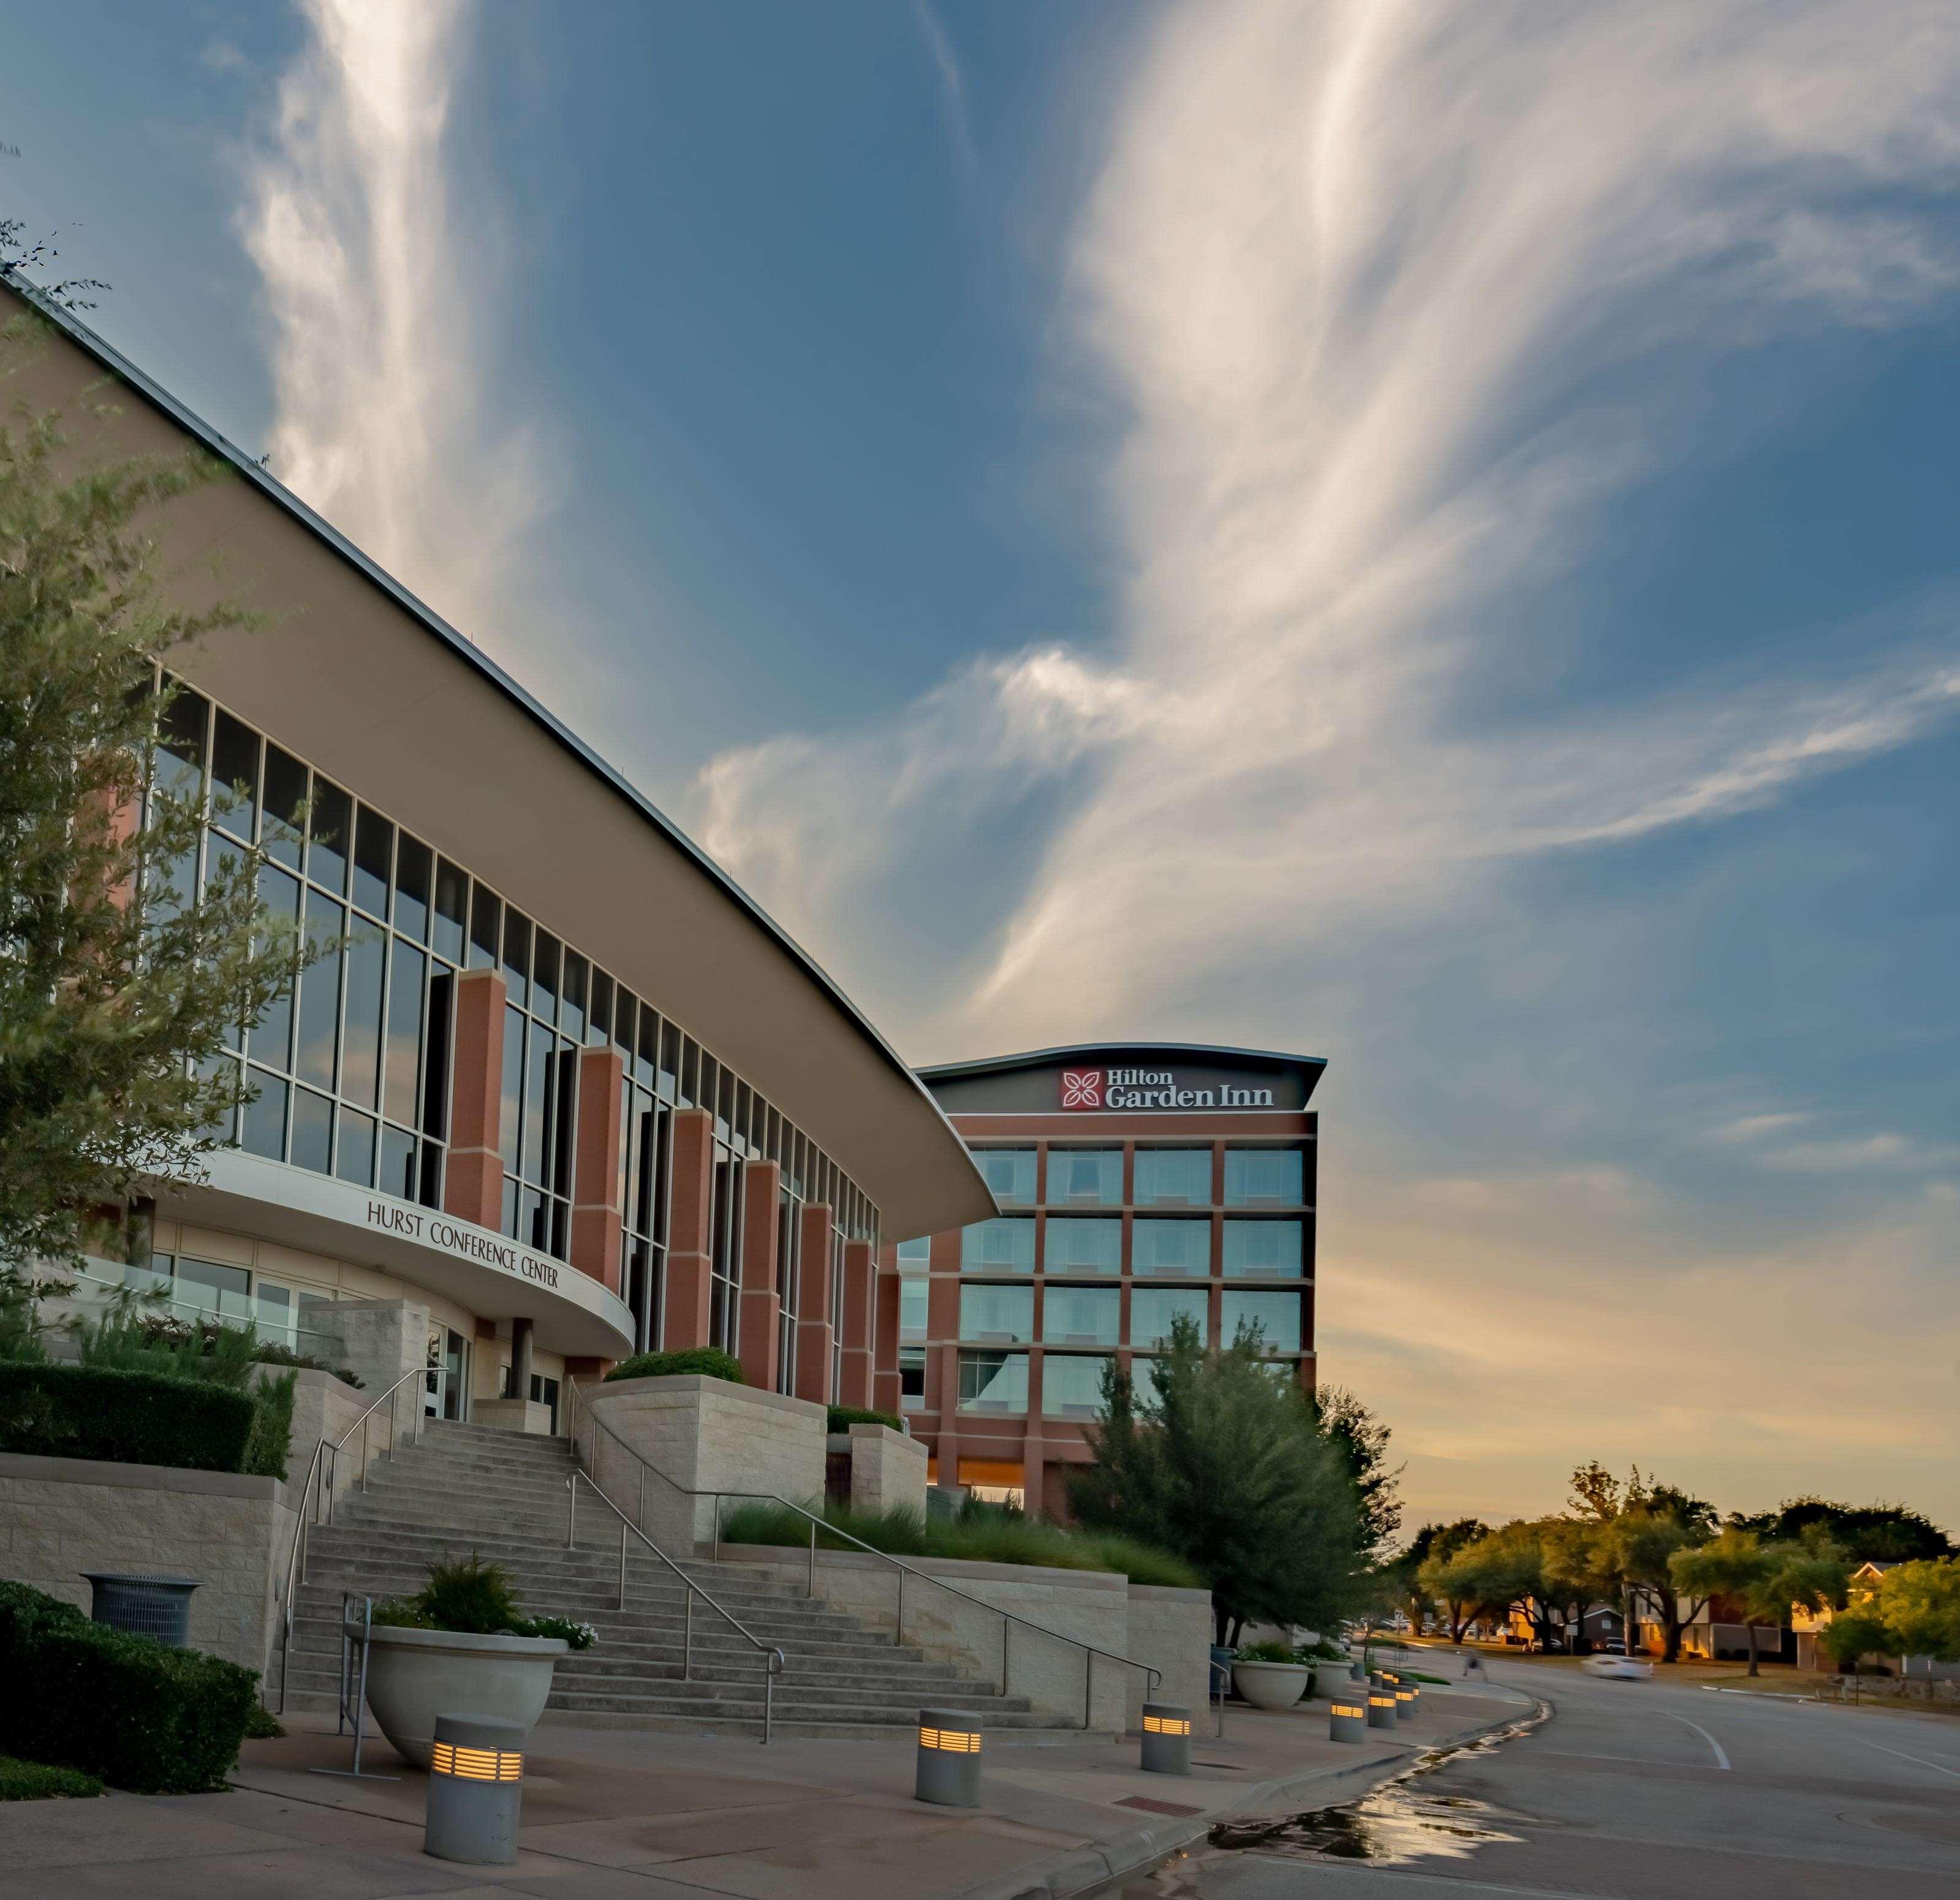 Hilton Garden Inn Dallas at Hurst Conference Center image 5